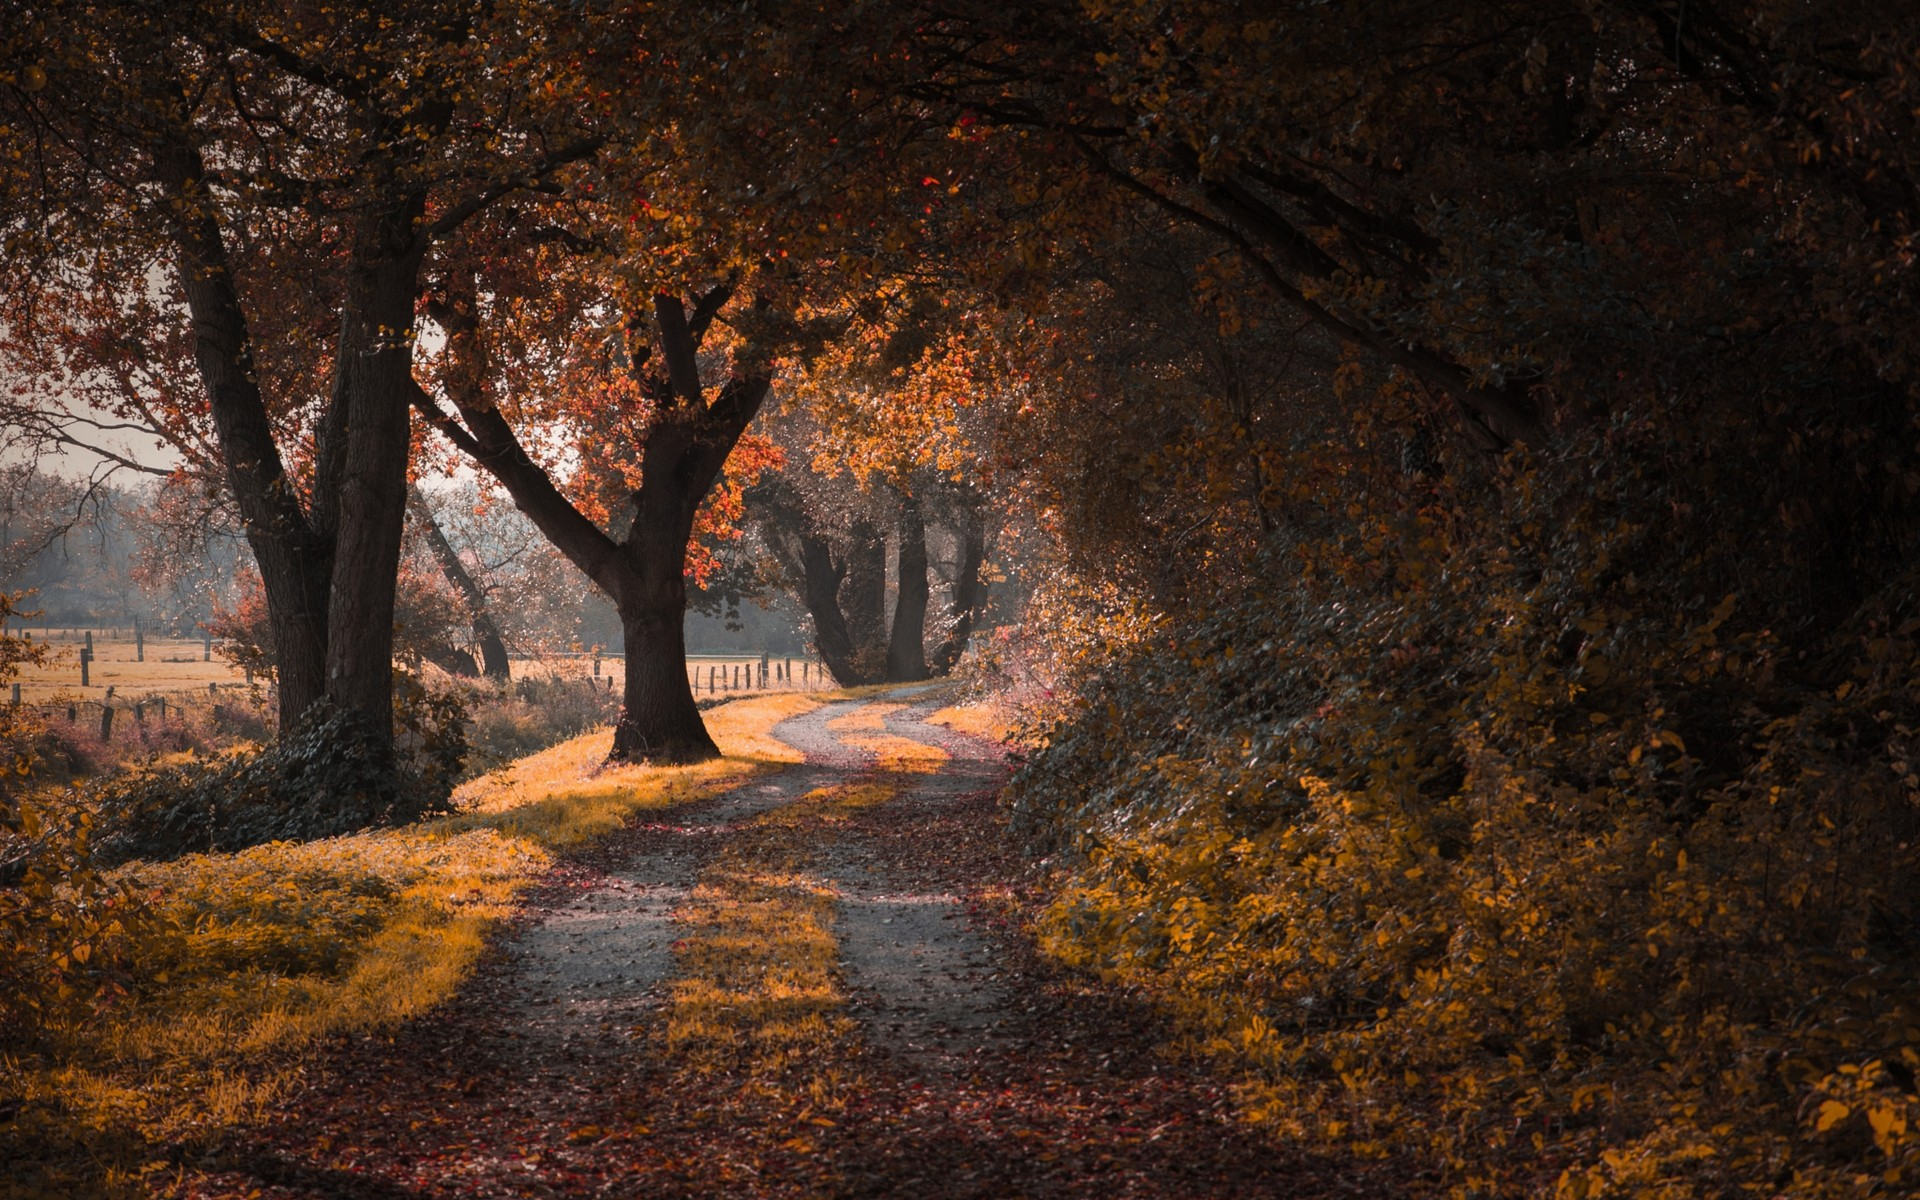 Autumn Falling Leaves Wallpaper Landscape Nature Road Fall Trees Leaves Shrubs